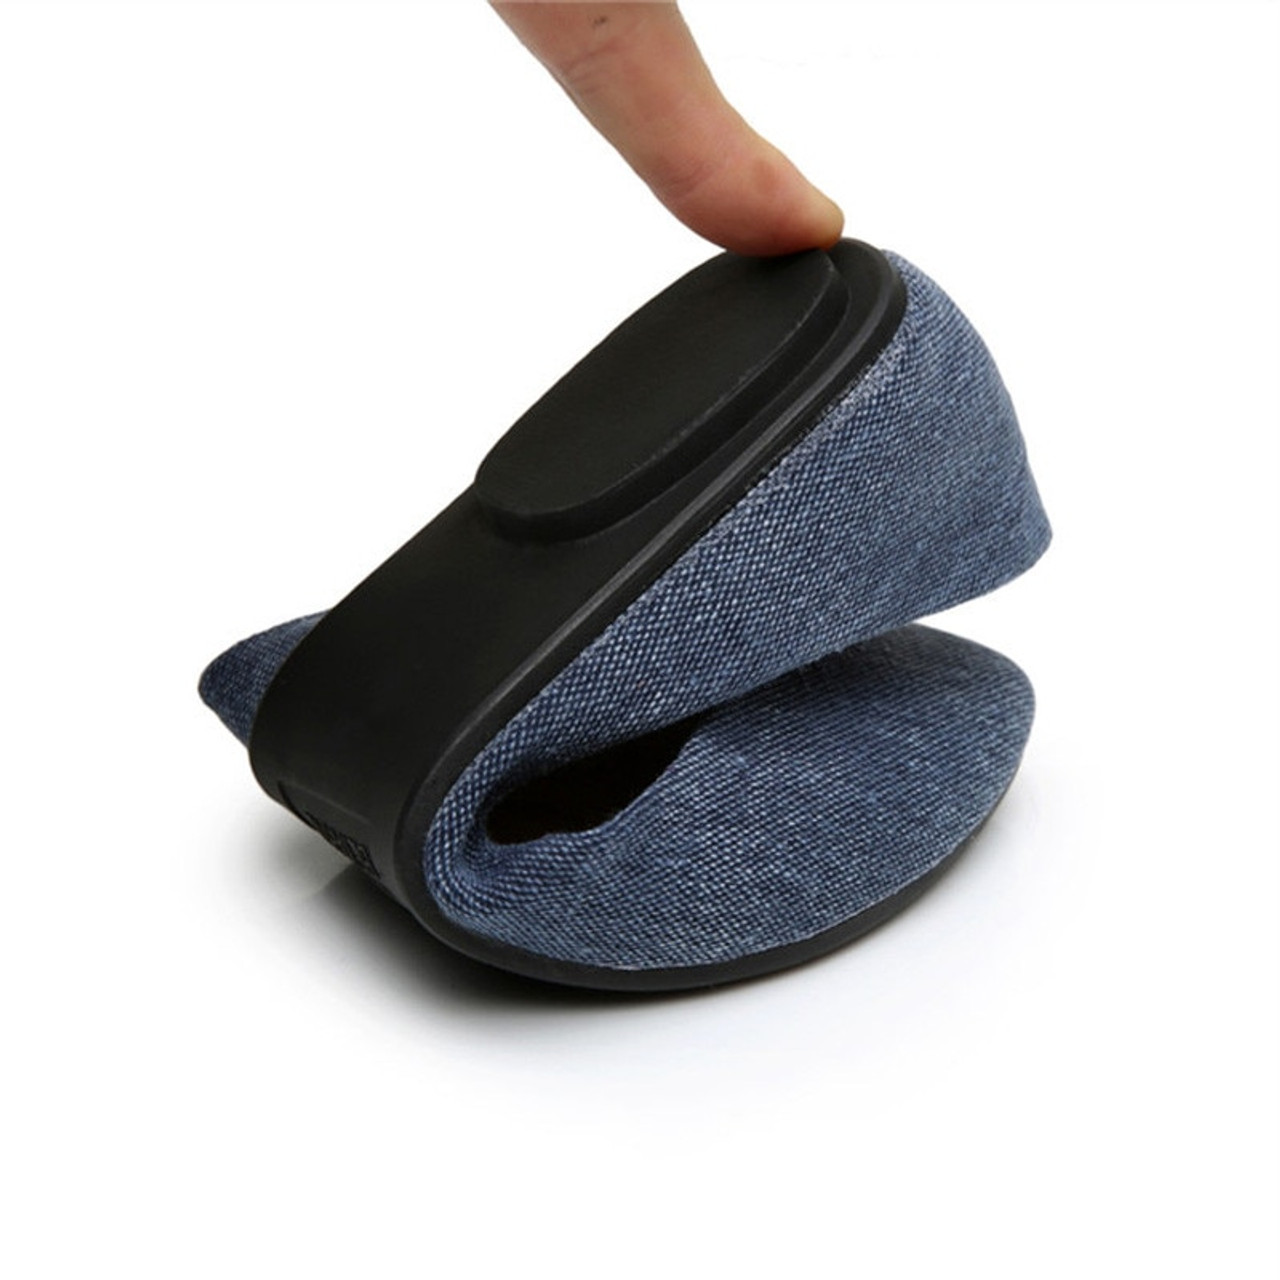 ... TIMETANG New Women Soft Denim Flats Blue Fashion High Quality Basic  Pointy Toe Ballerina Ballet Flat ... f4cb70e72d5c